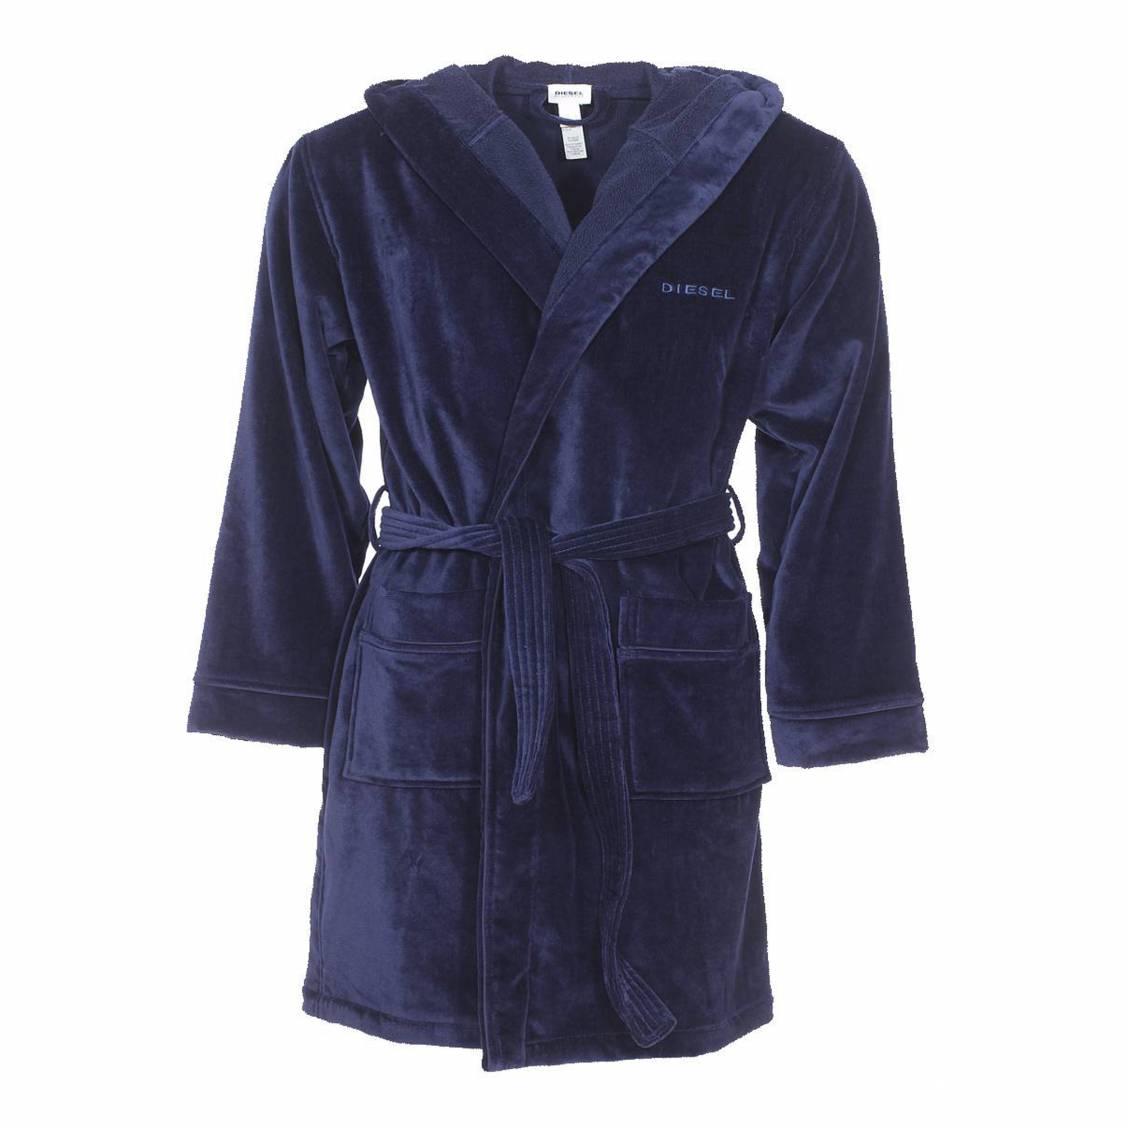 Peignoir de bain capuche diesel bleu marine brod diesel rue des hommes for Peignoir homme capuche